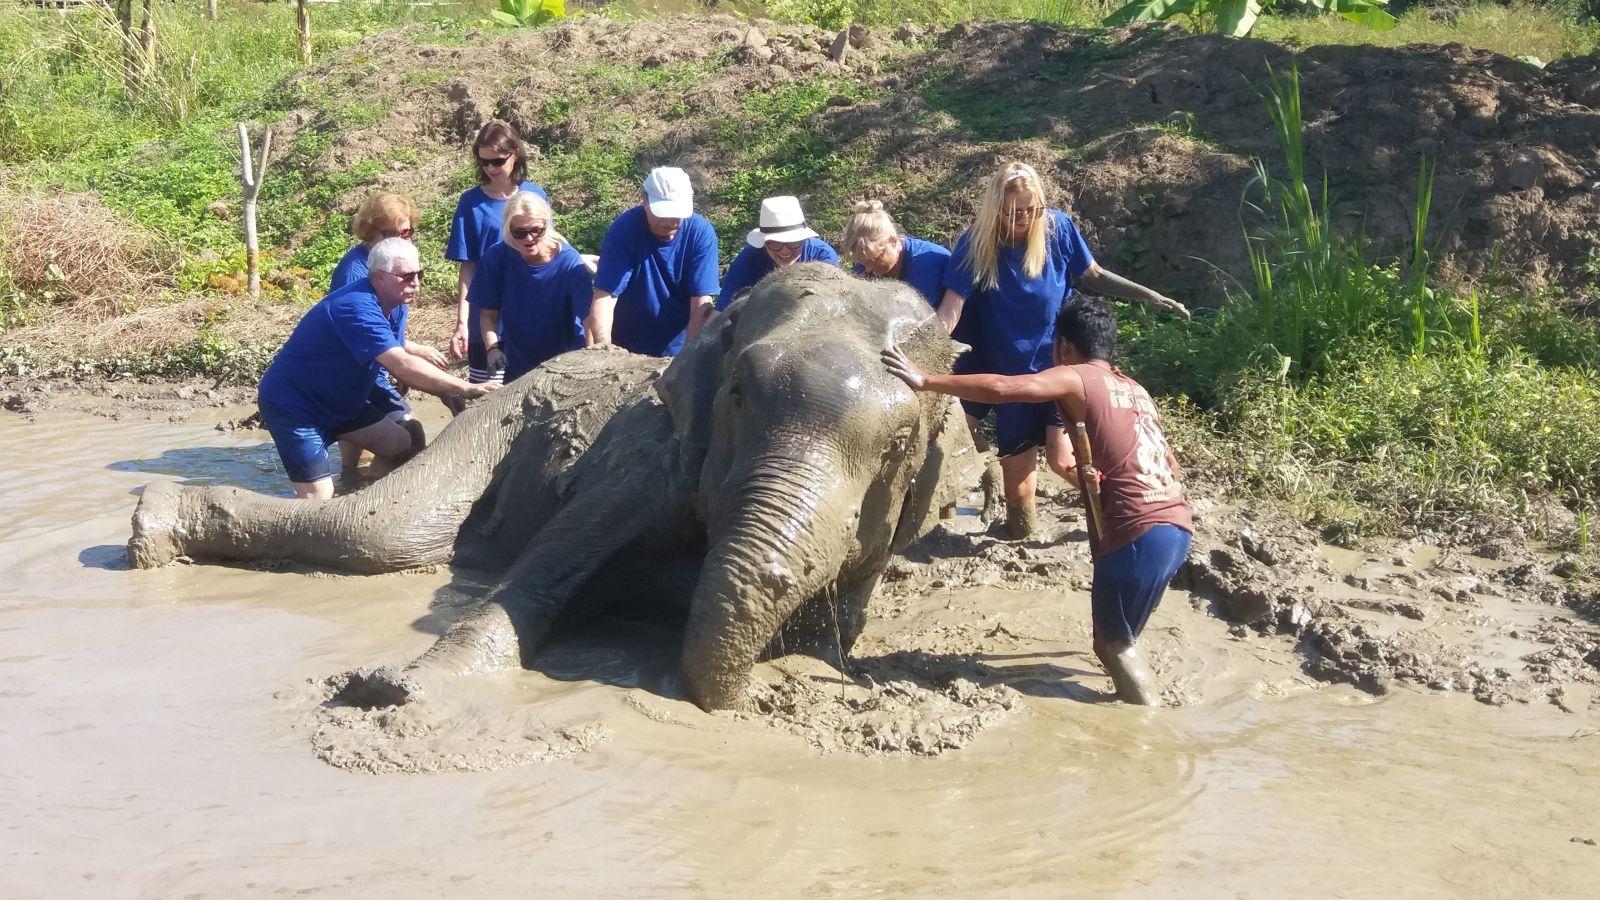 Kąpiel błotna ze słoniami.